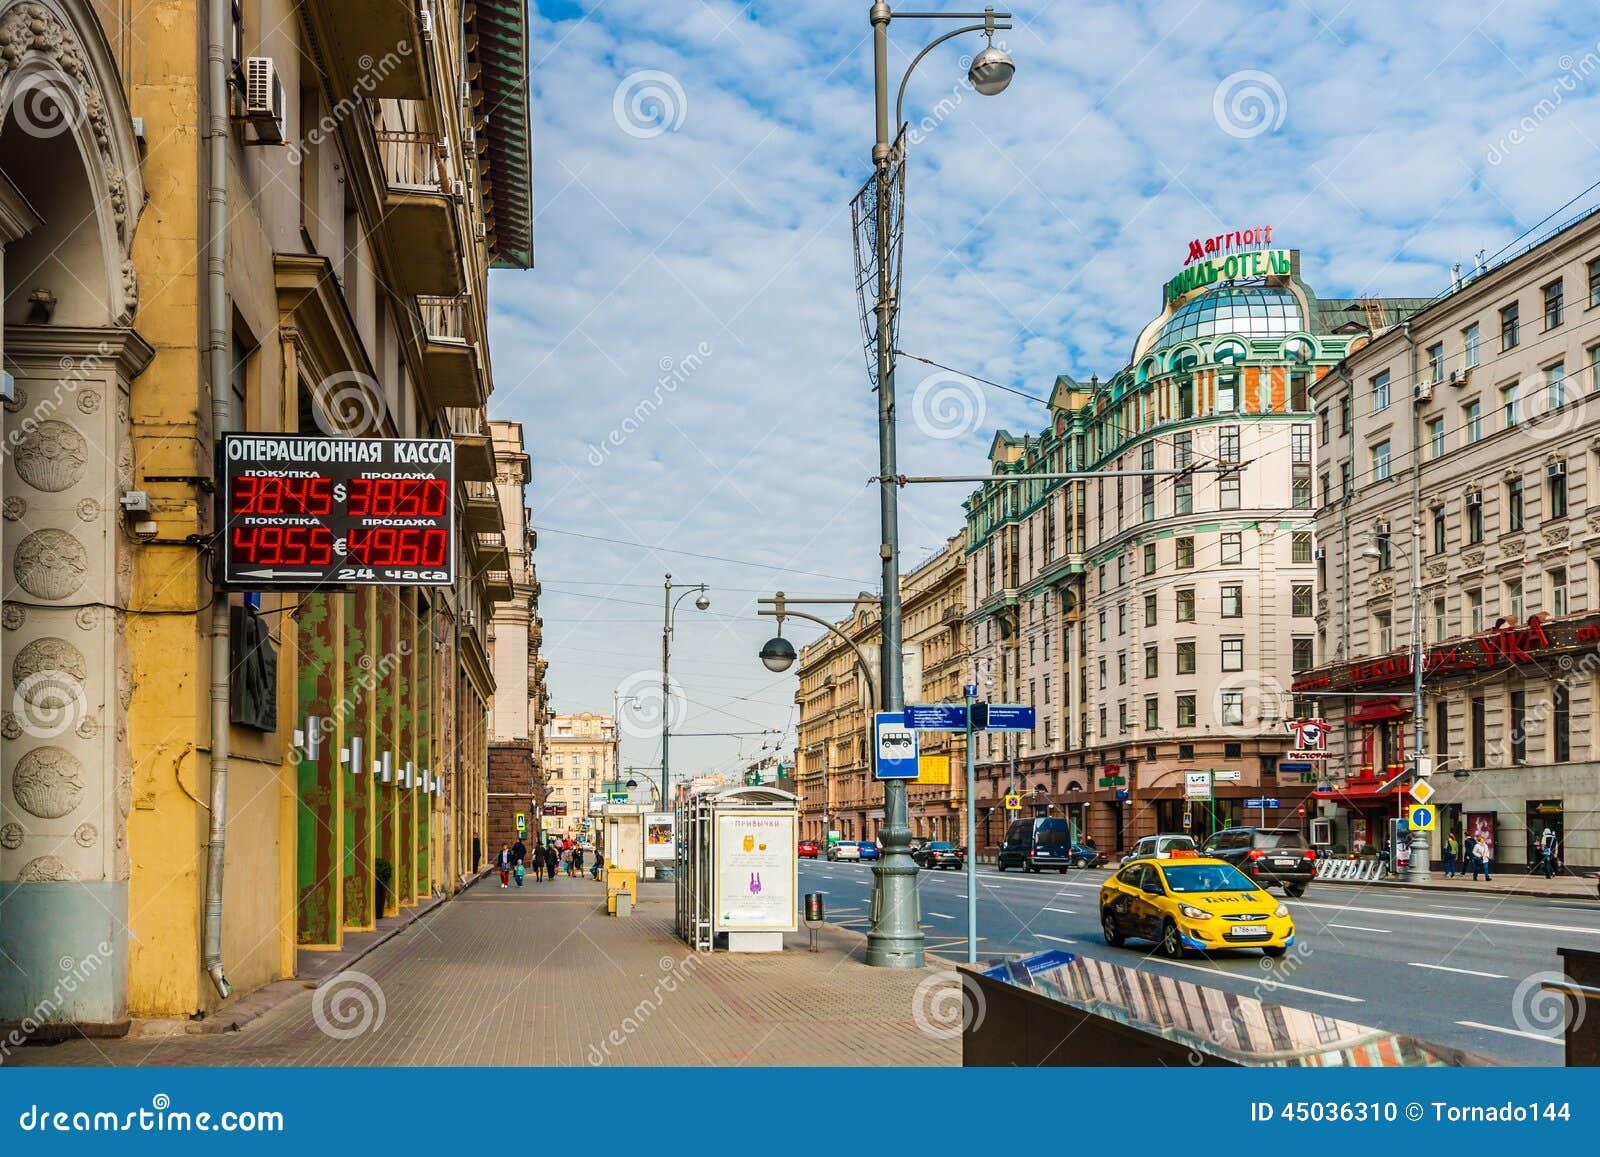 Tverskaya Street Of Moscow Editorial Image - Image: 45036310